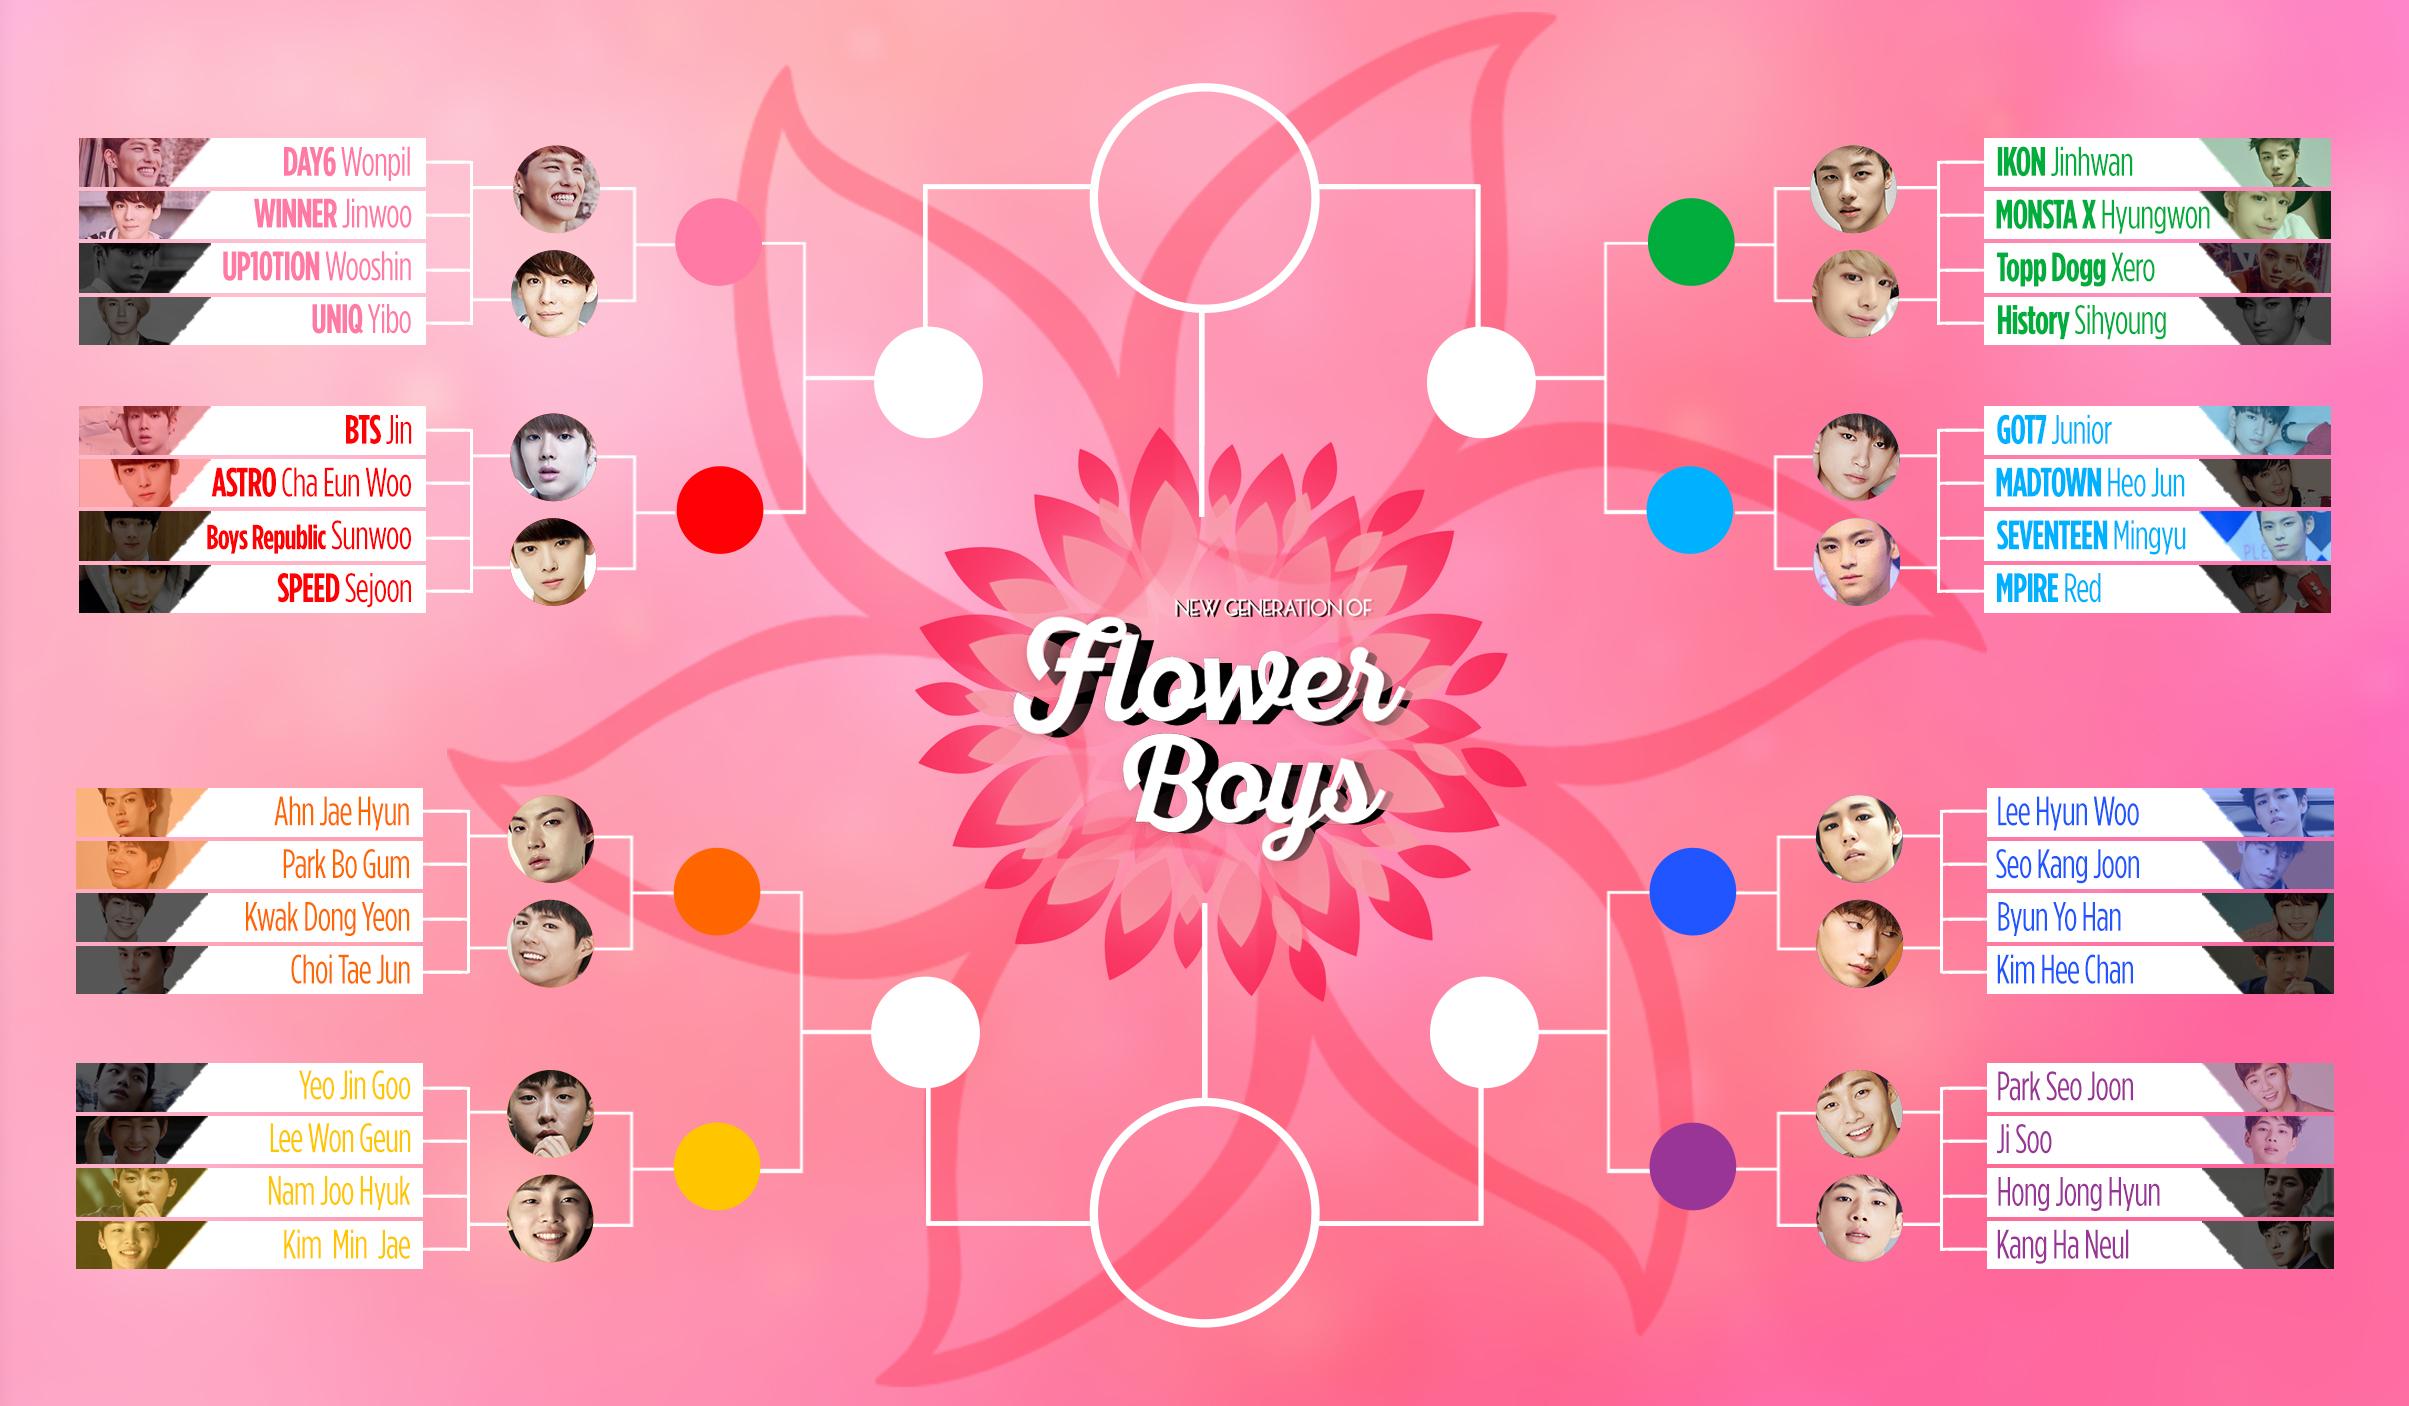 new generation flower boy round two bracket